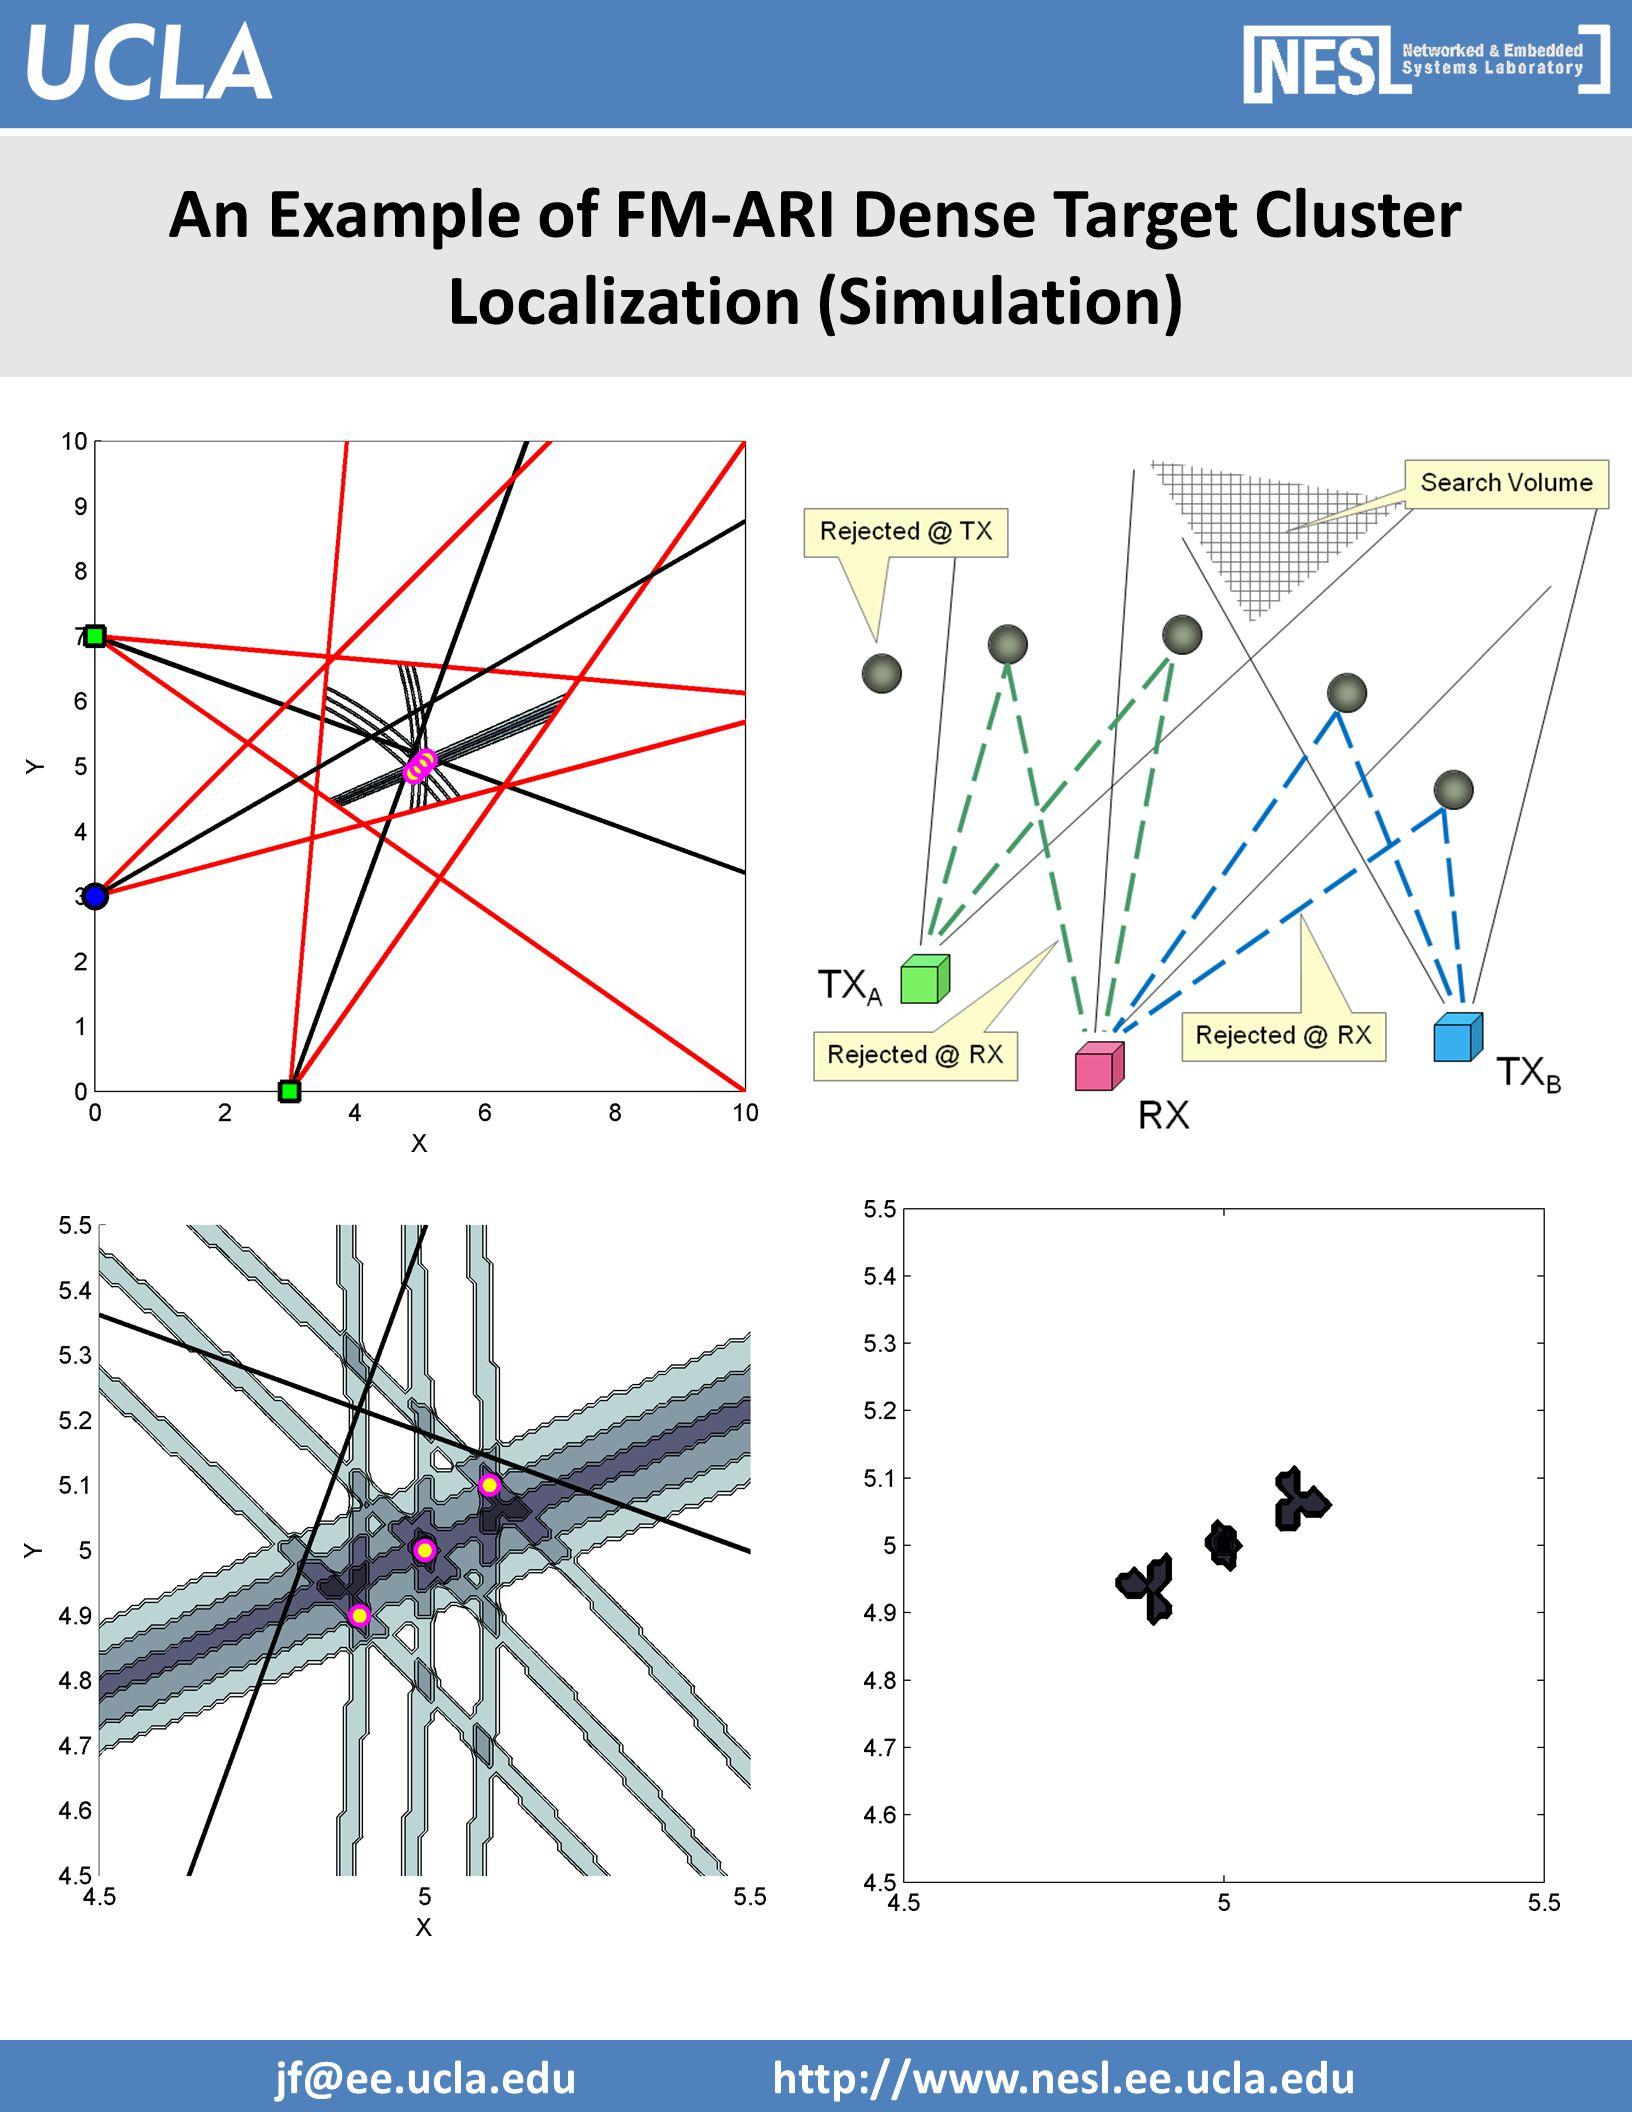 jf@ee.ucla.edu http://www.nesl.ee.ucla.edu An Example of FM-ARI Dense Target Cluster Localization (Simulation)